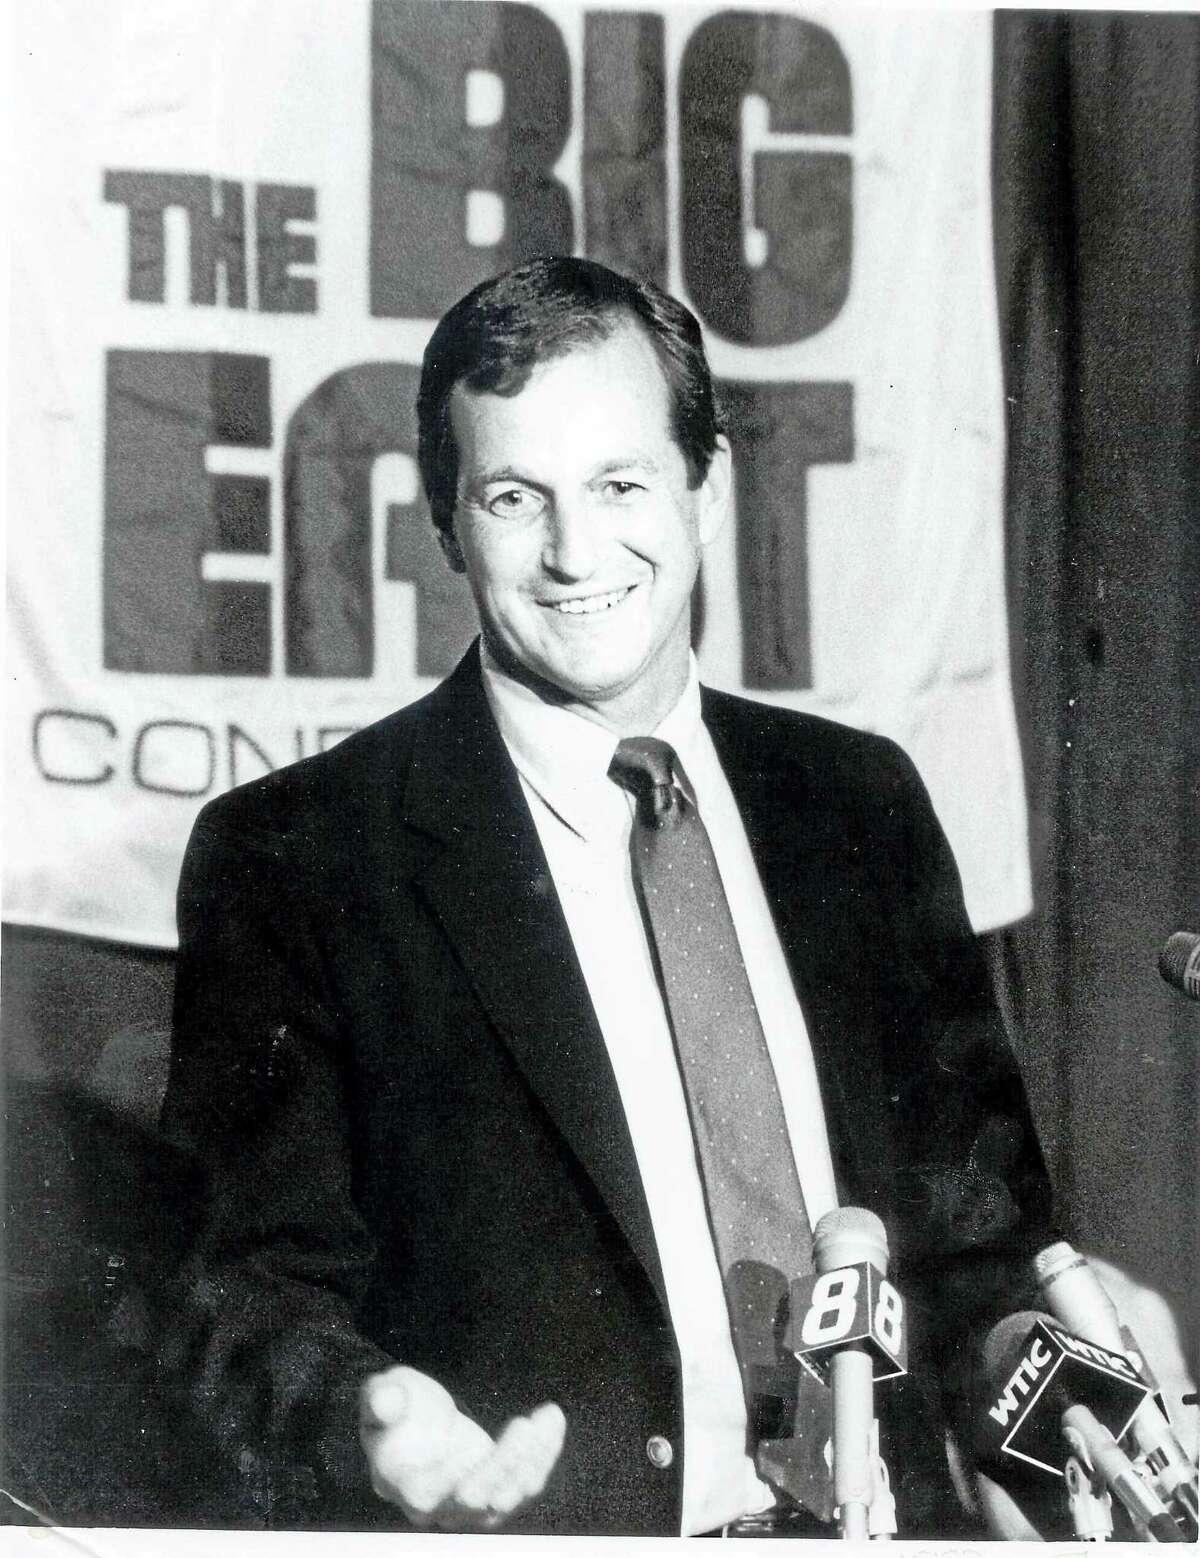 Jim Calhoun was named coach of the UConn men's basketball team on May 15, 1986.